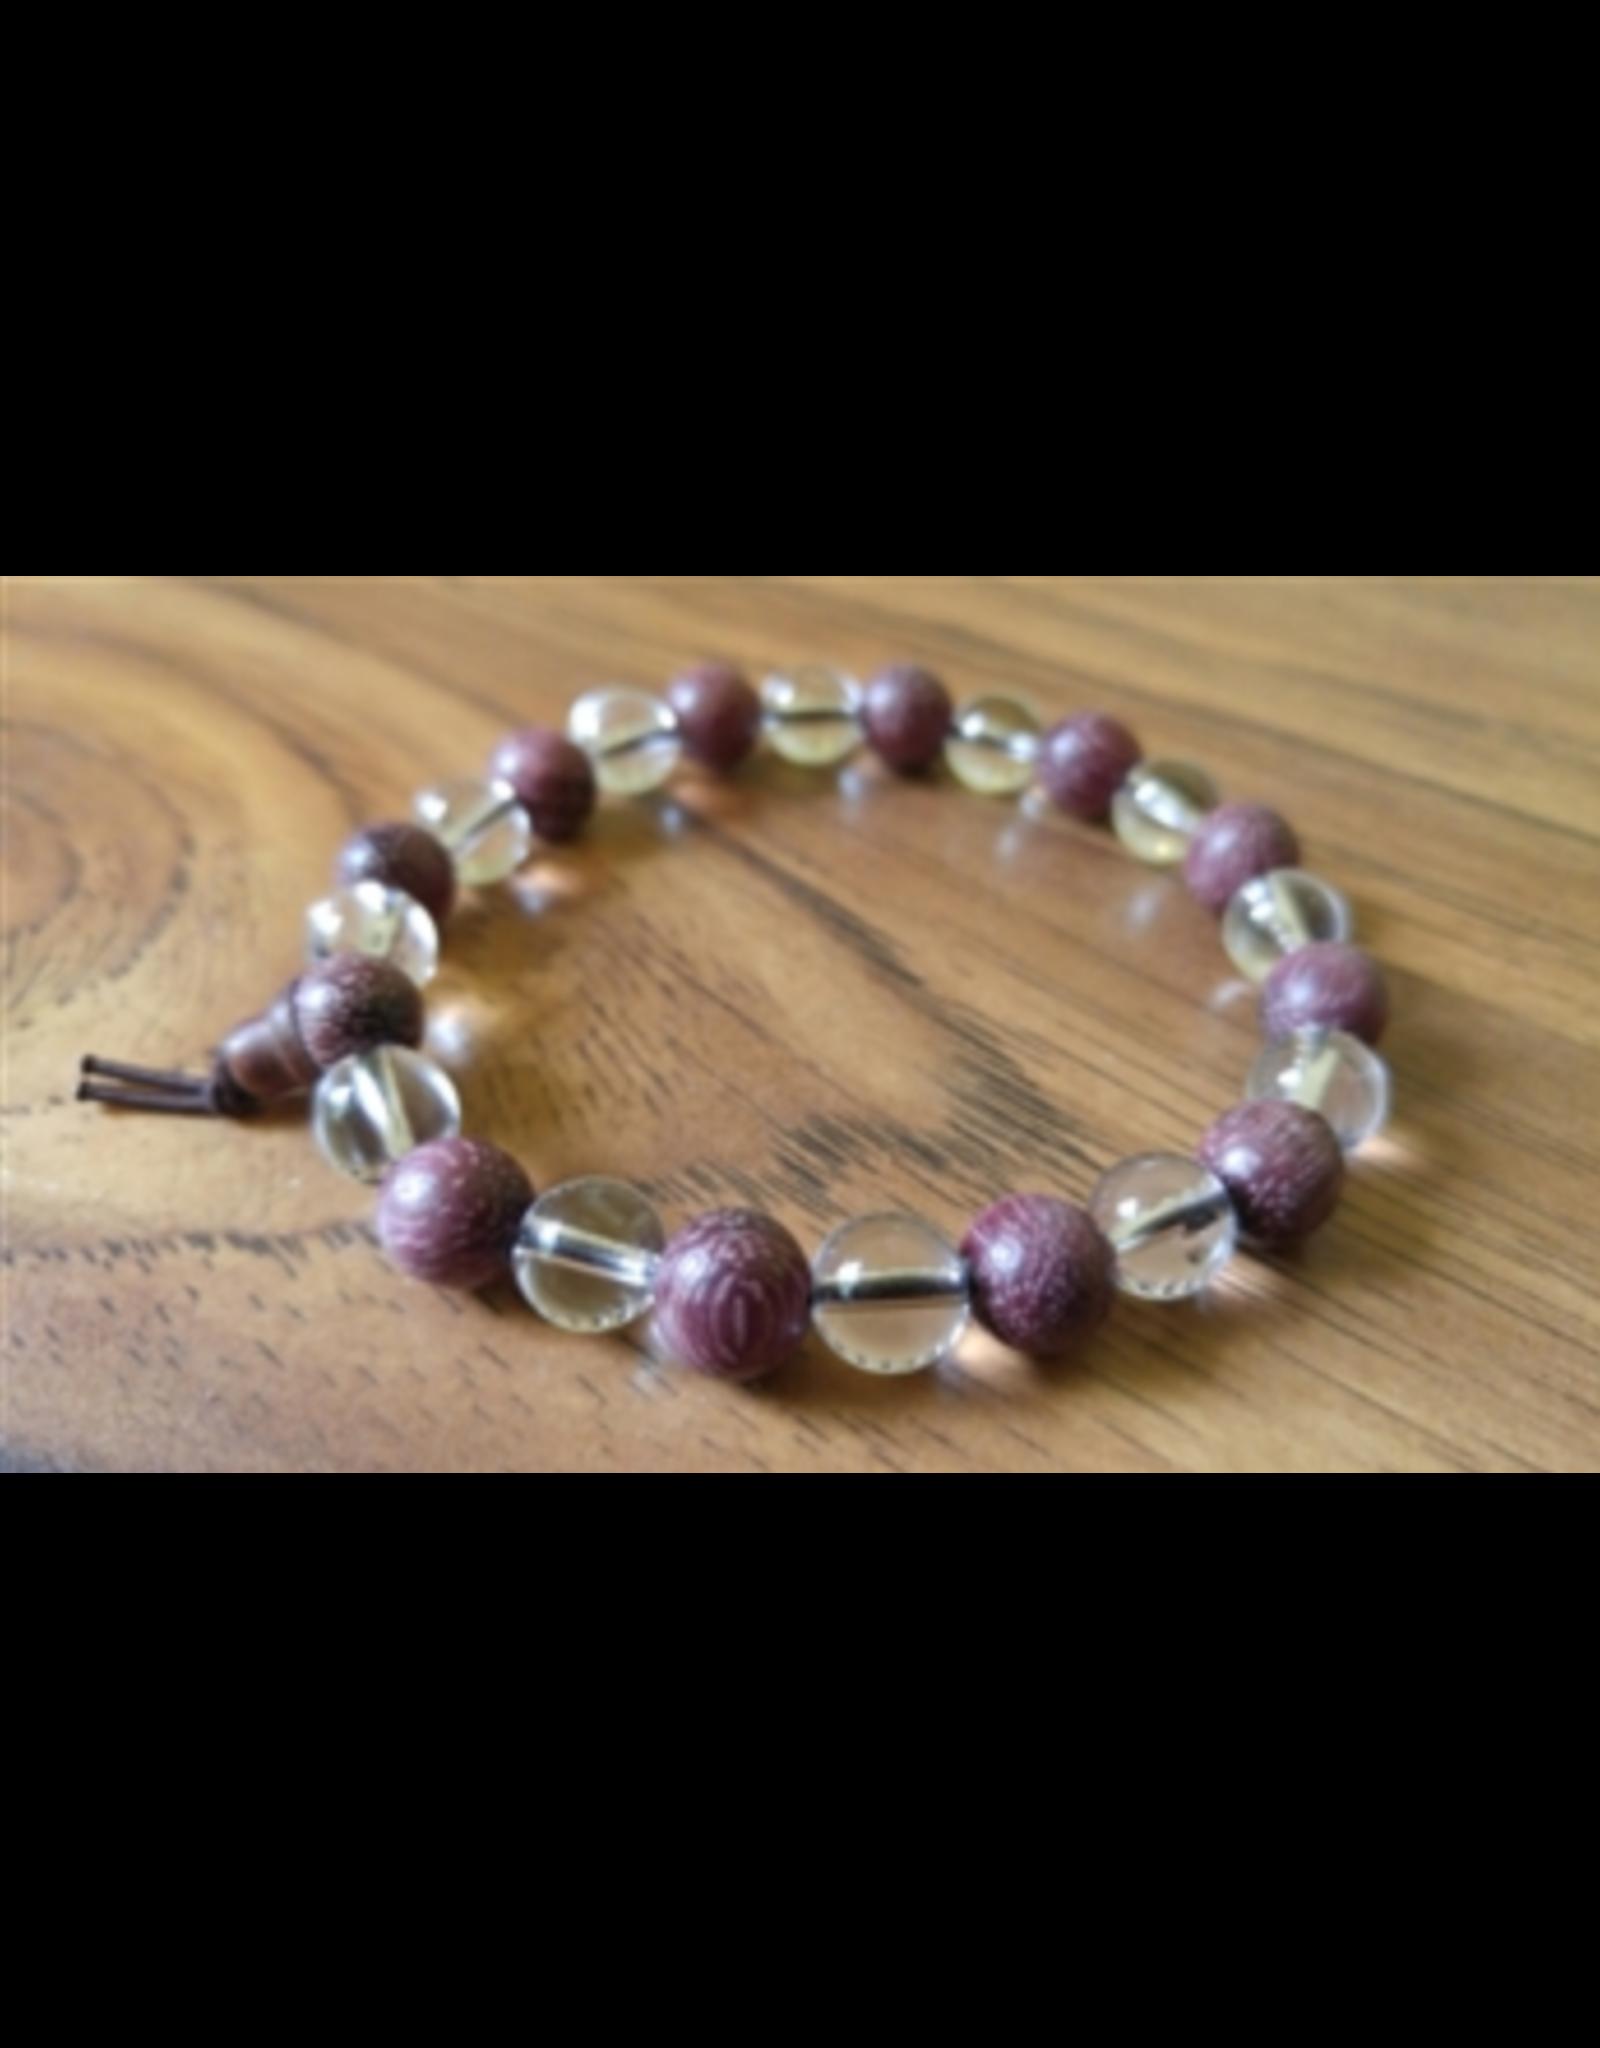 Crystal and Purpleheart Wood Mala